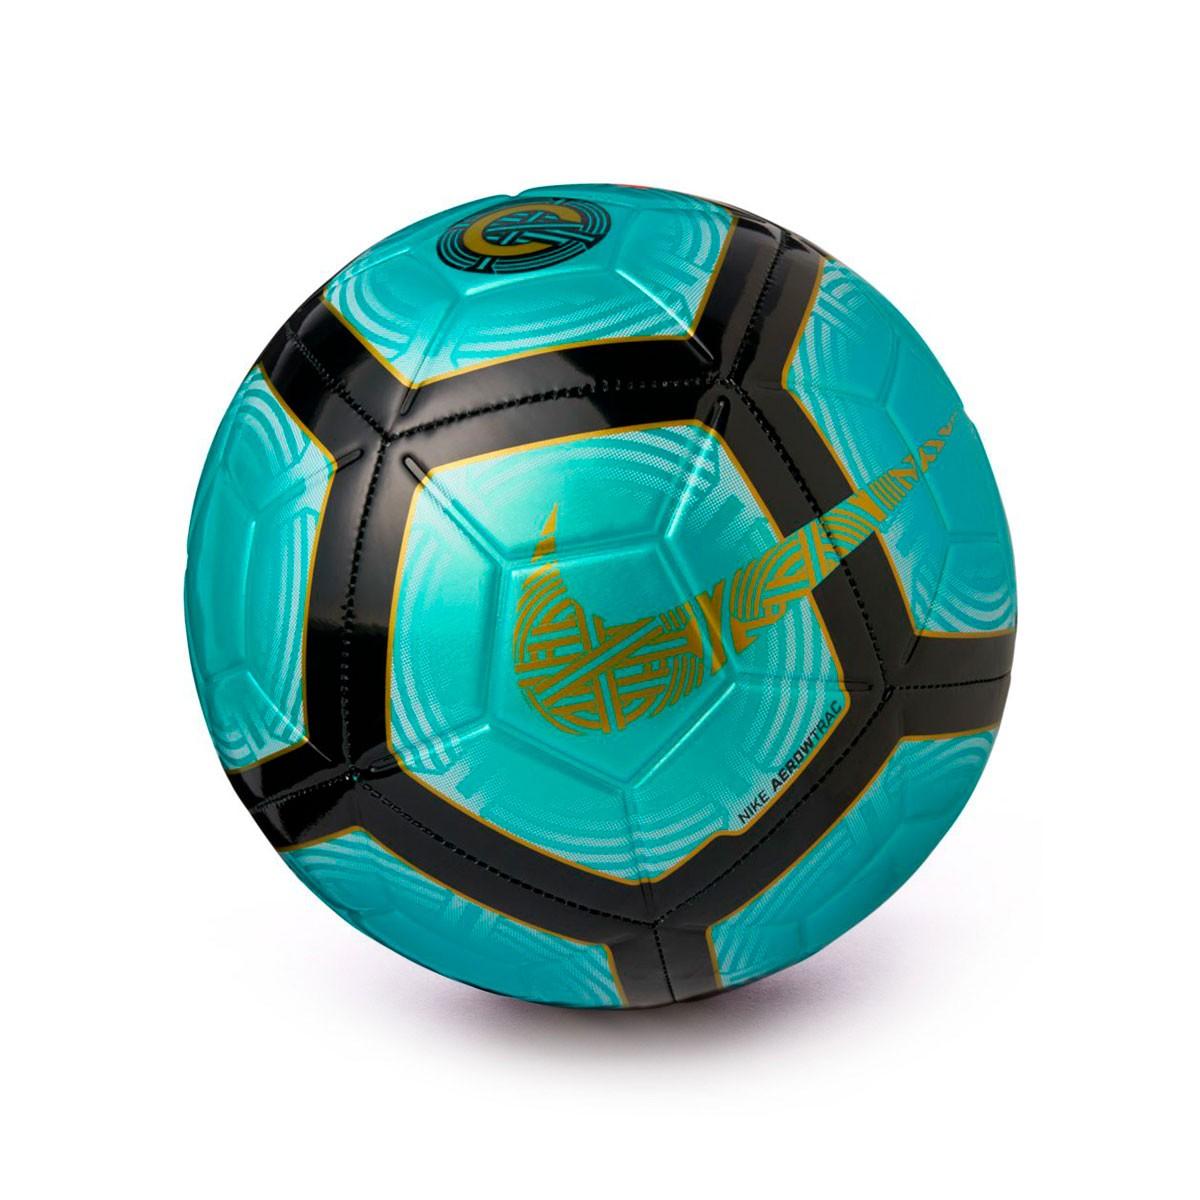 62c6dd4e6c42 Ball Nike Strike CR7 Clear emerald-Black-Gold - Football store ...